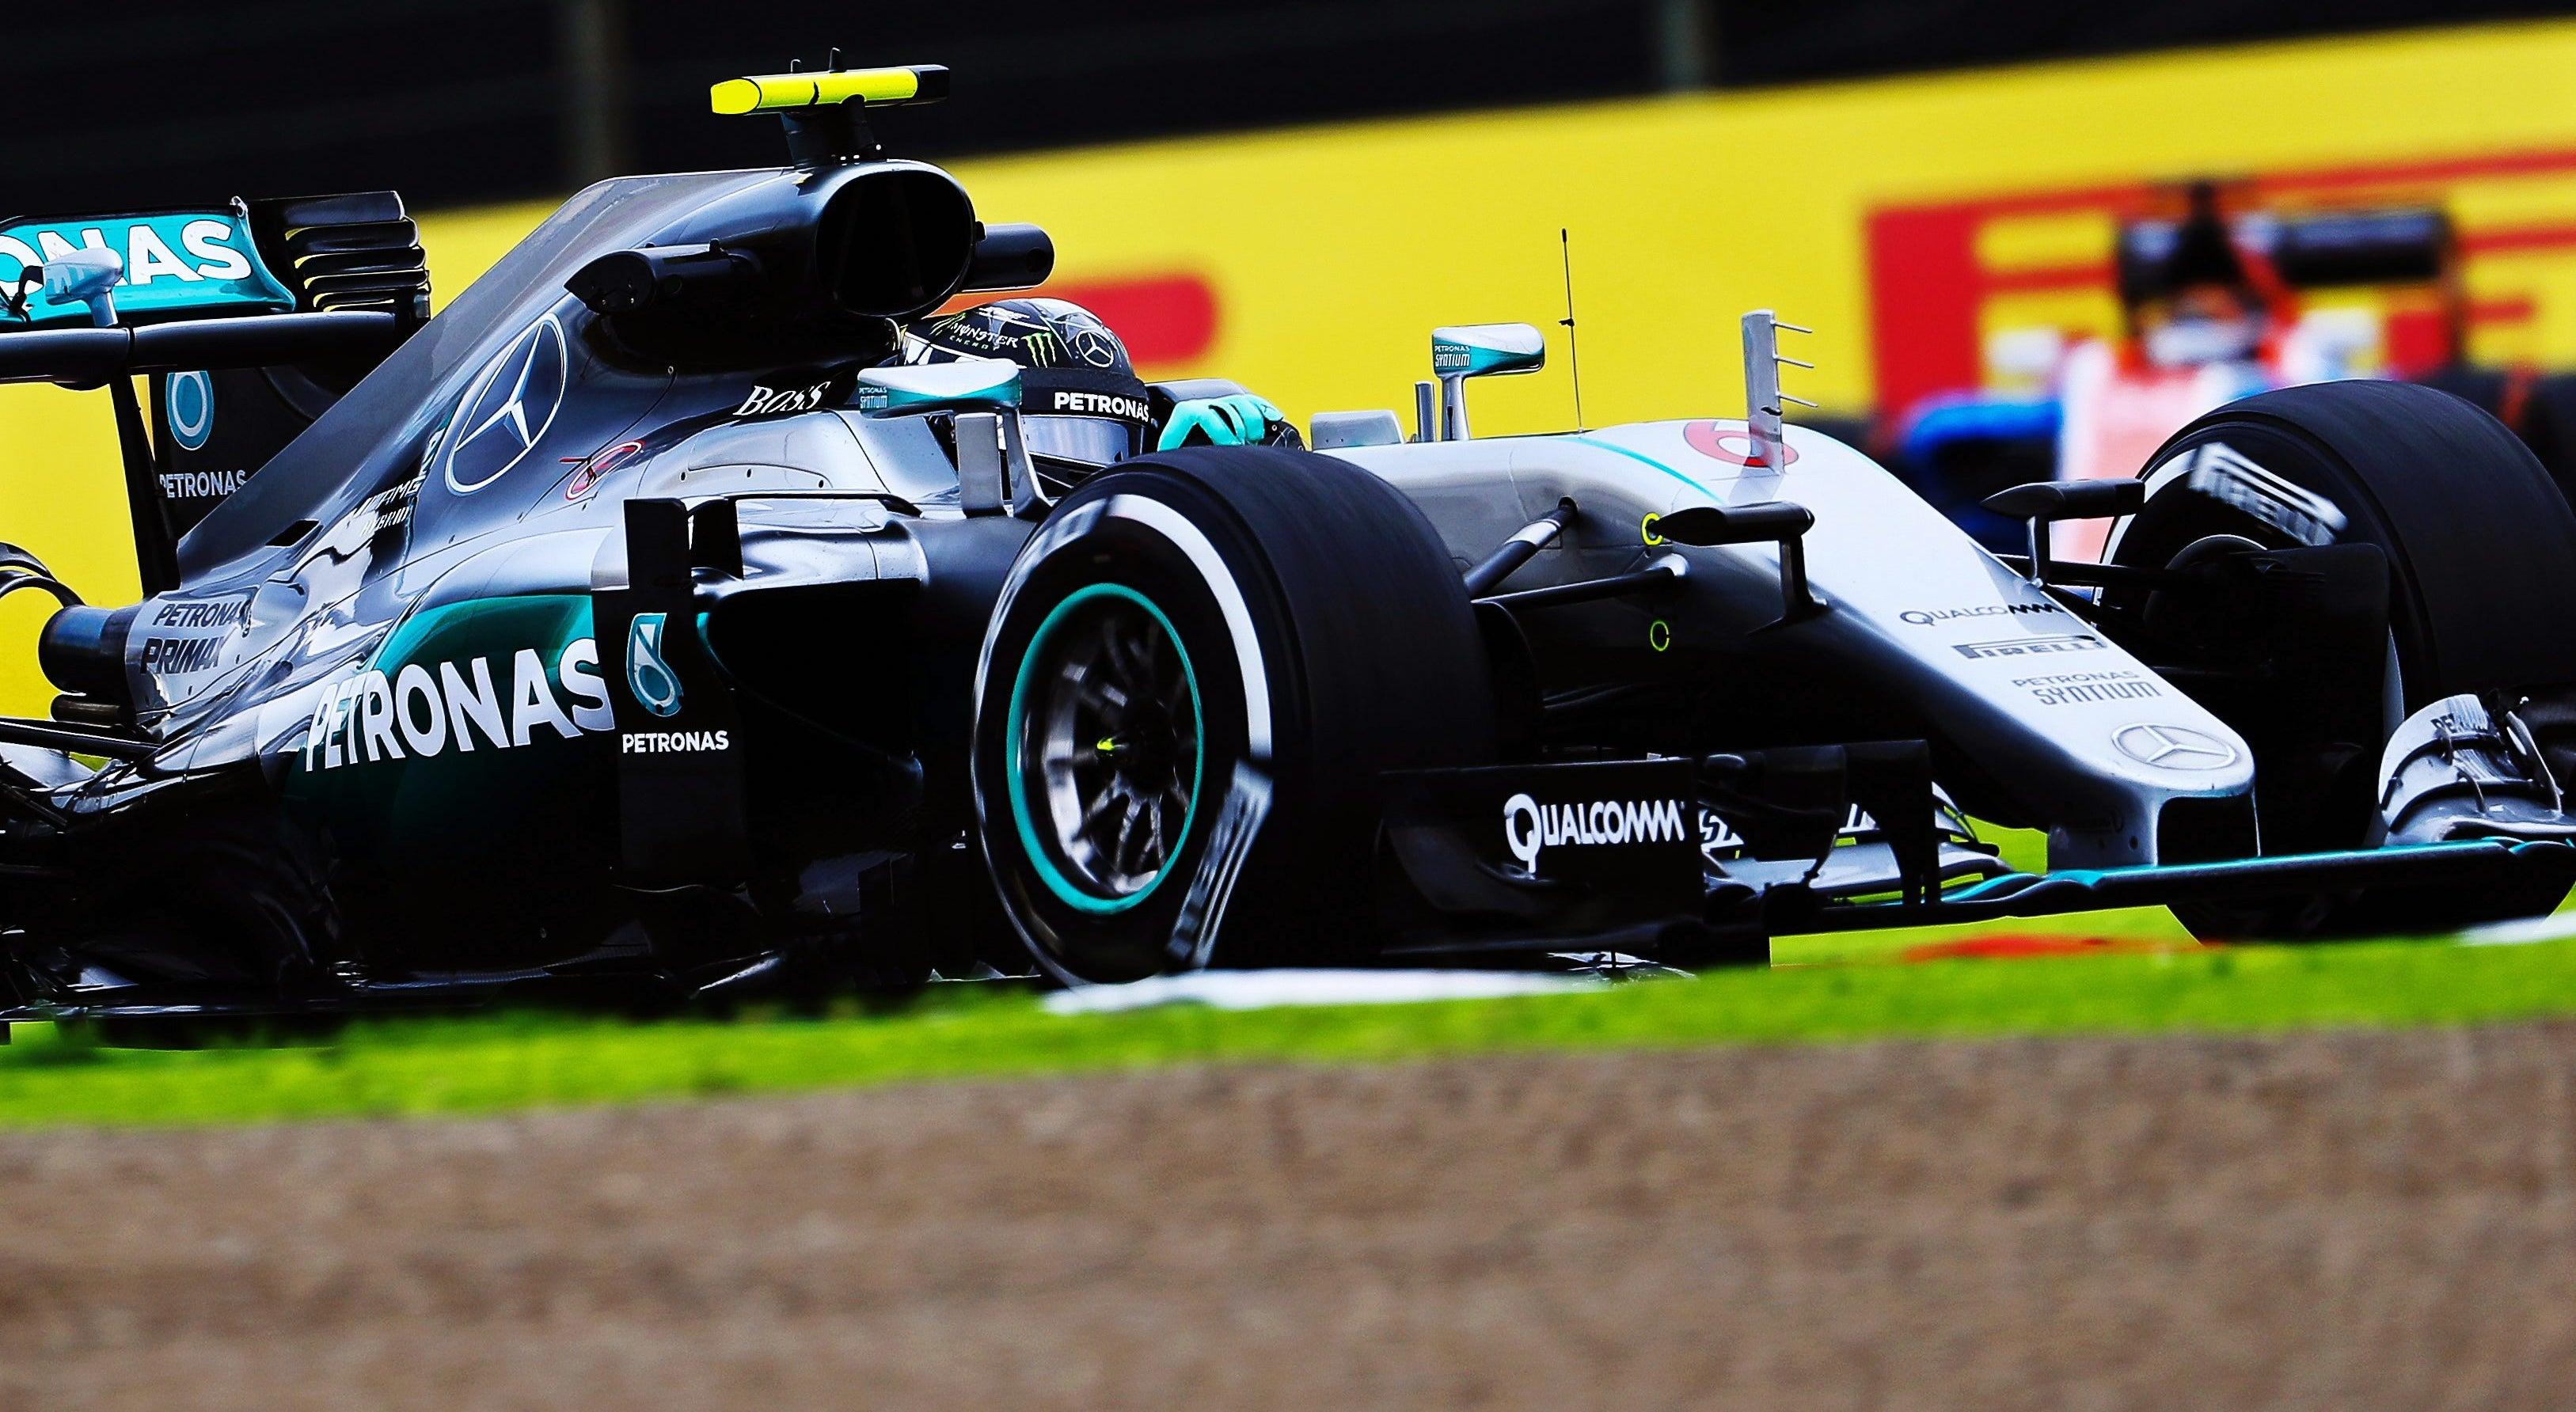 Rosberg garante pole em Suzuka